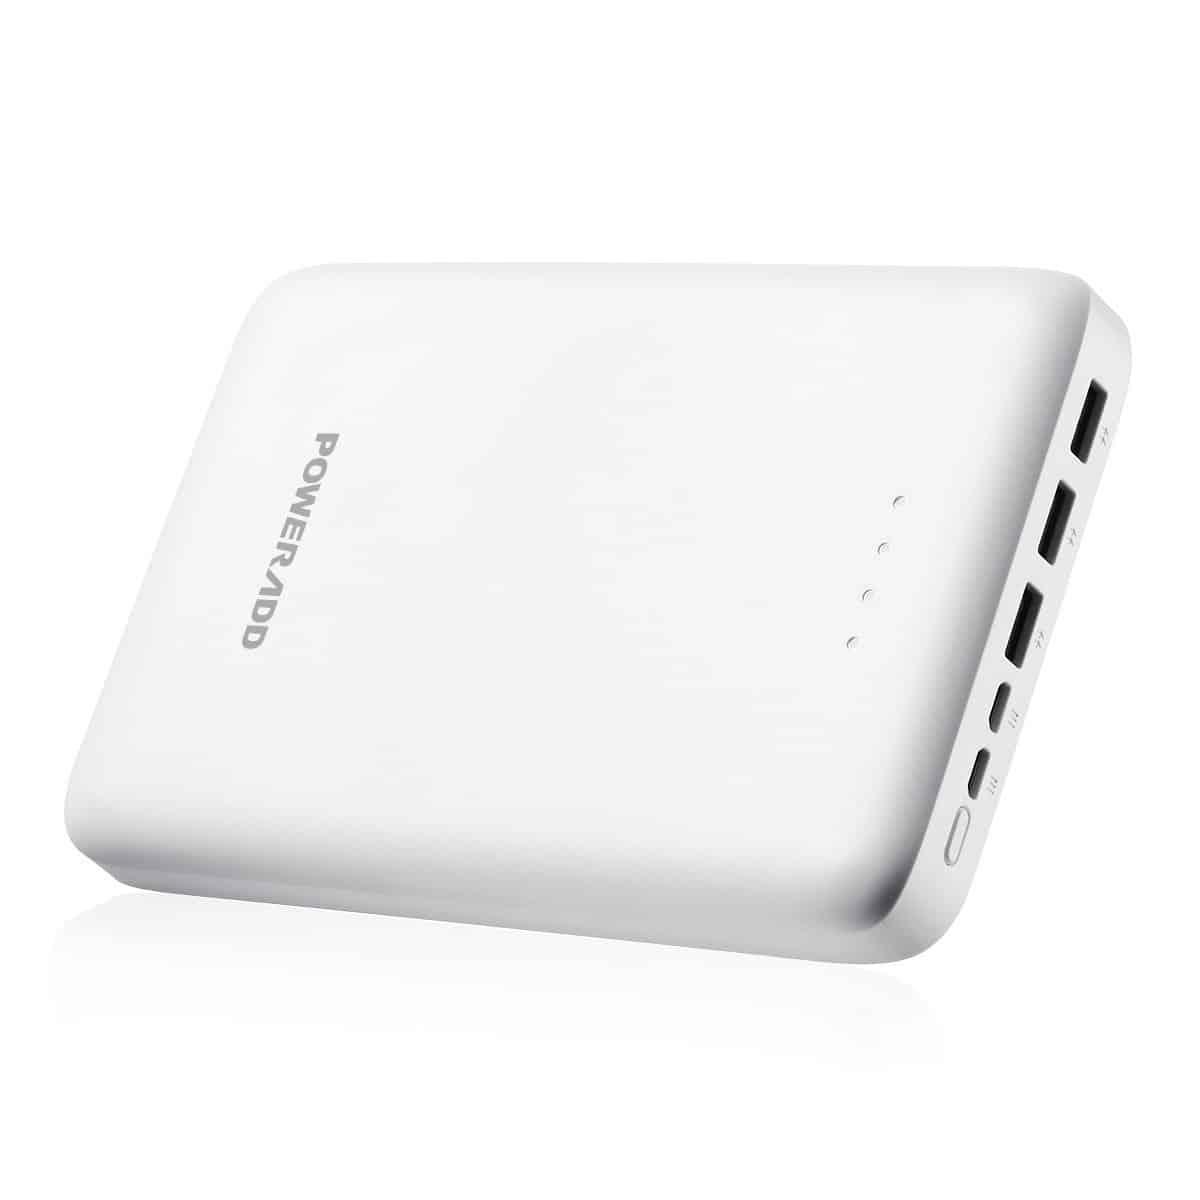 Meilleures Powerbanks iPhone X